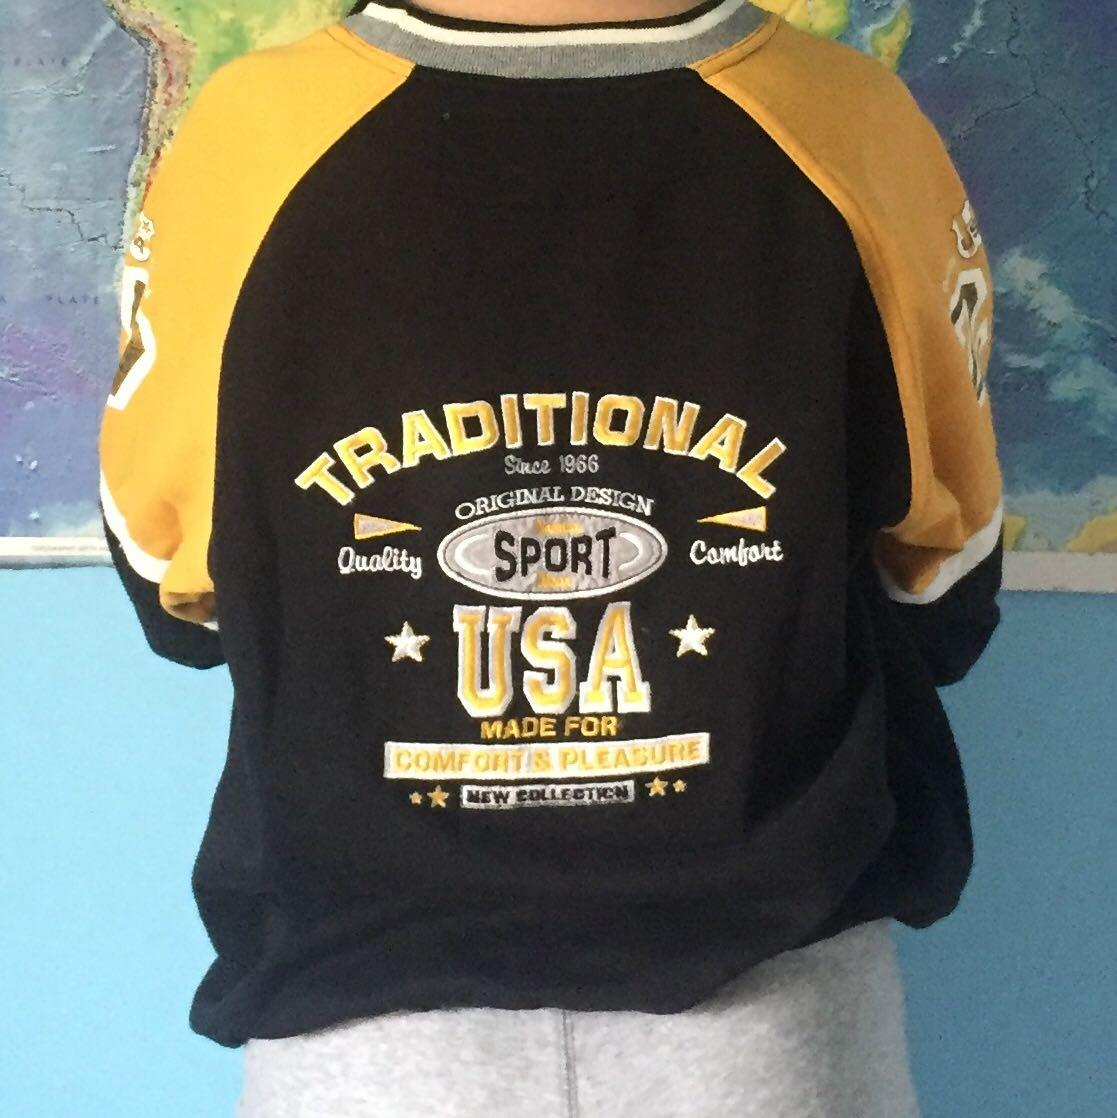 Vintage Black & Yellow Graphic Sweatshirt (design on sleeves & back)